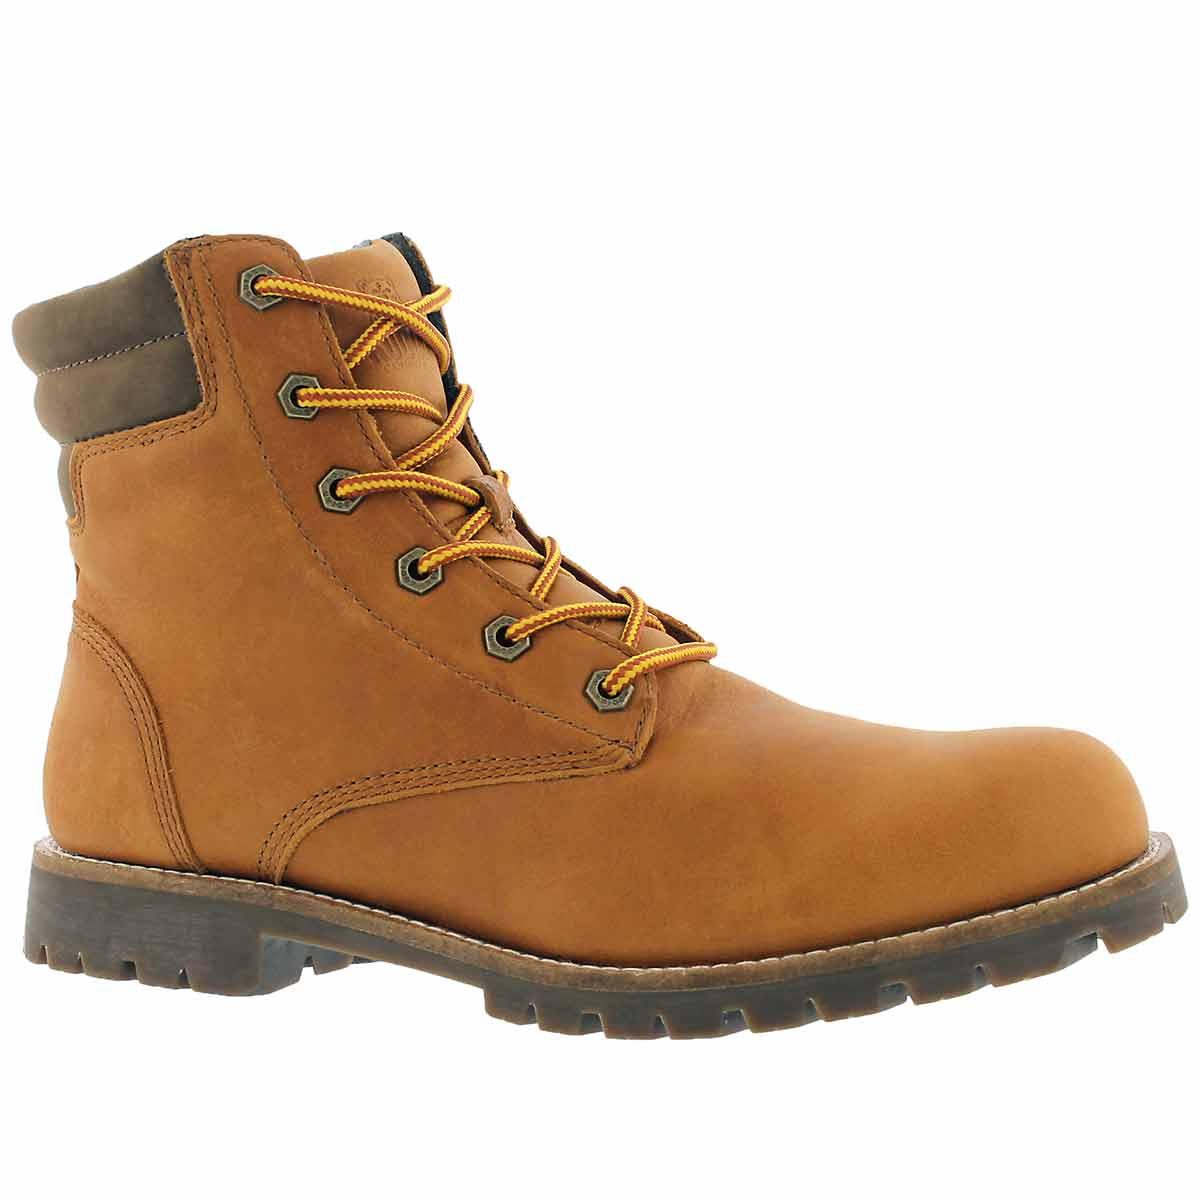 Men's MAGOG waterproof caramel ankle boots